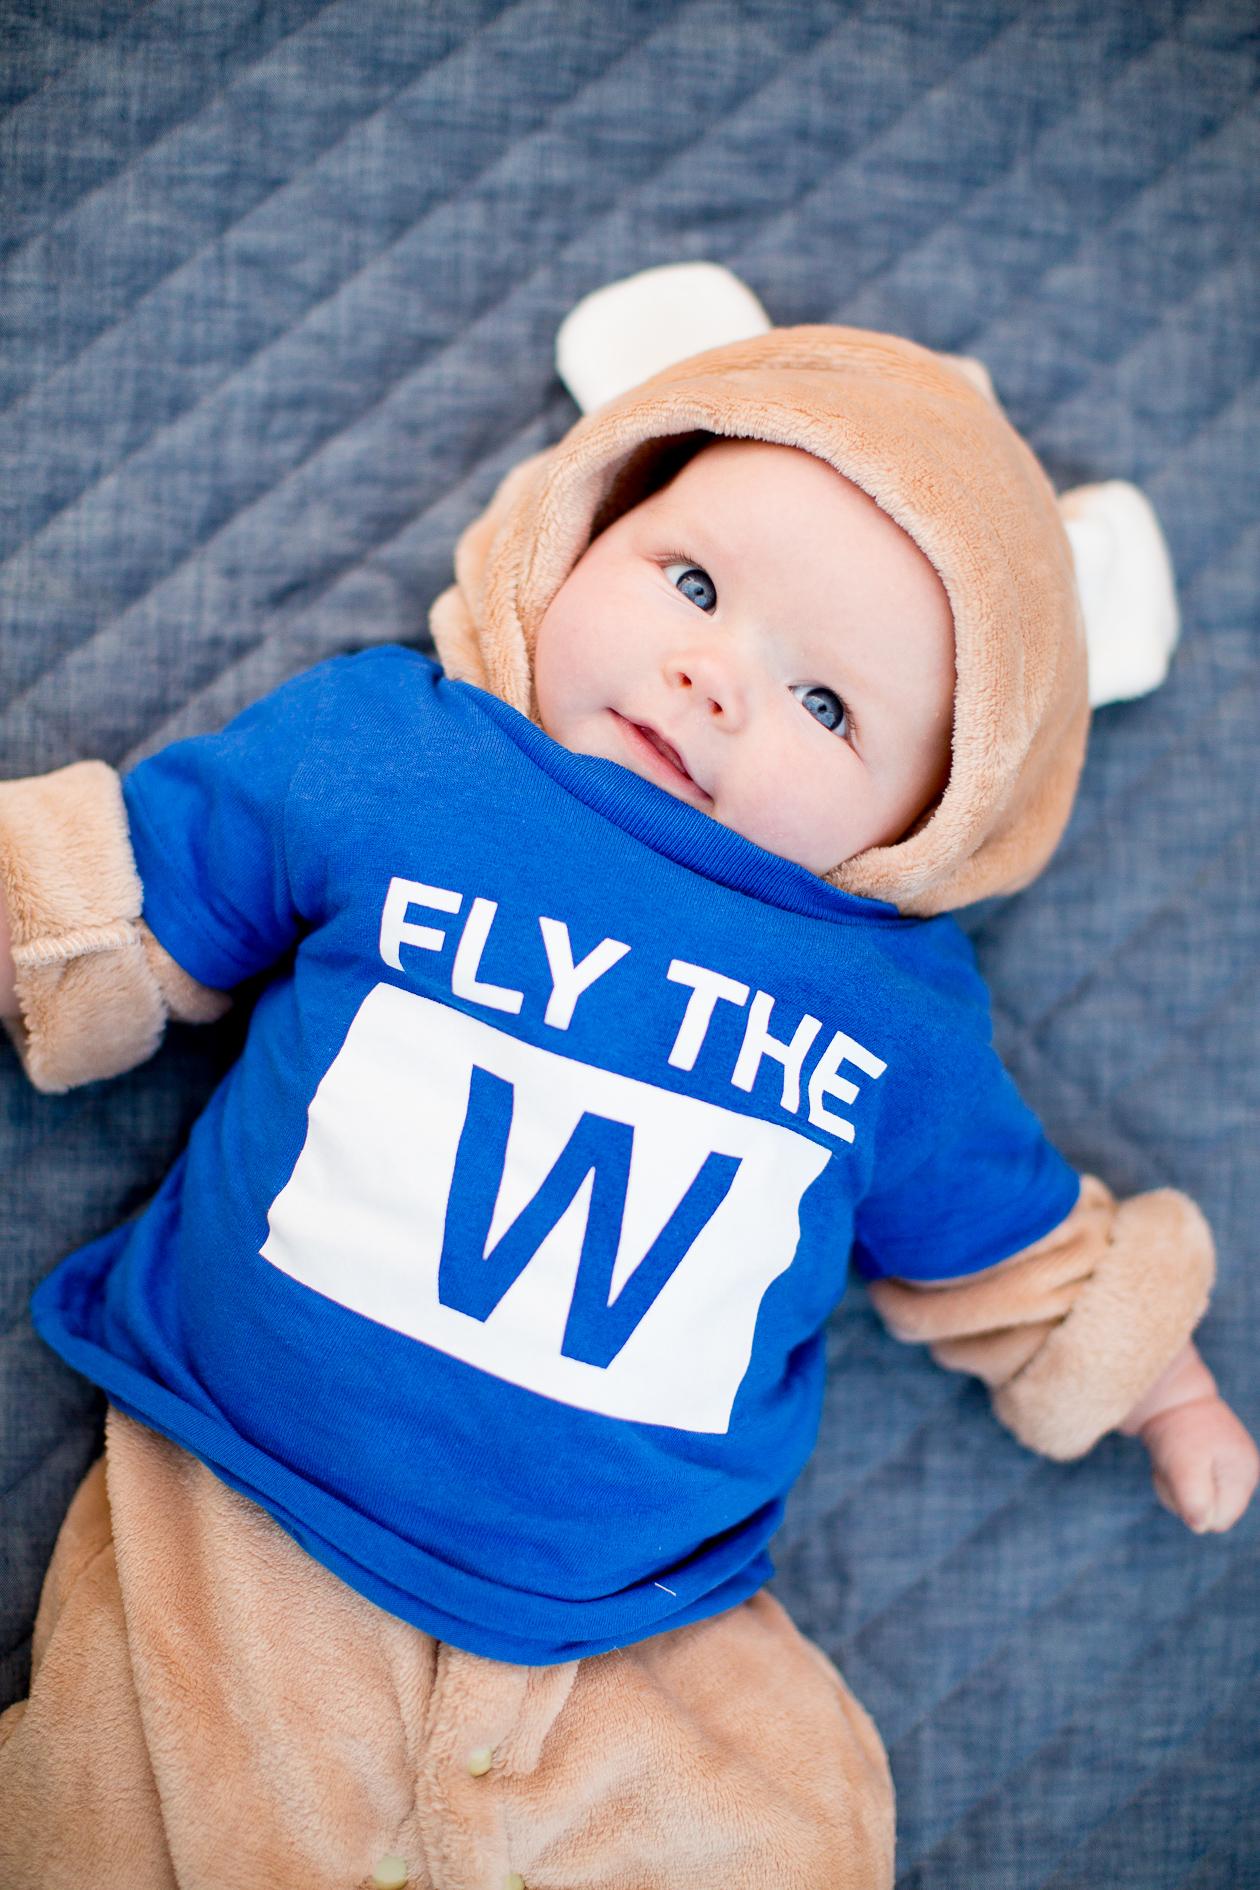 baby-bear-cub-costume-21